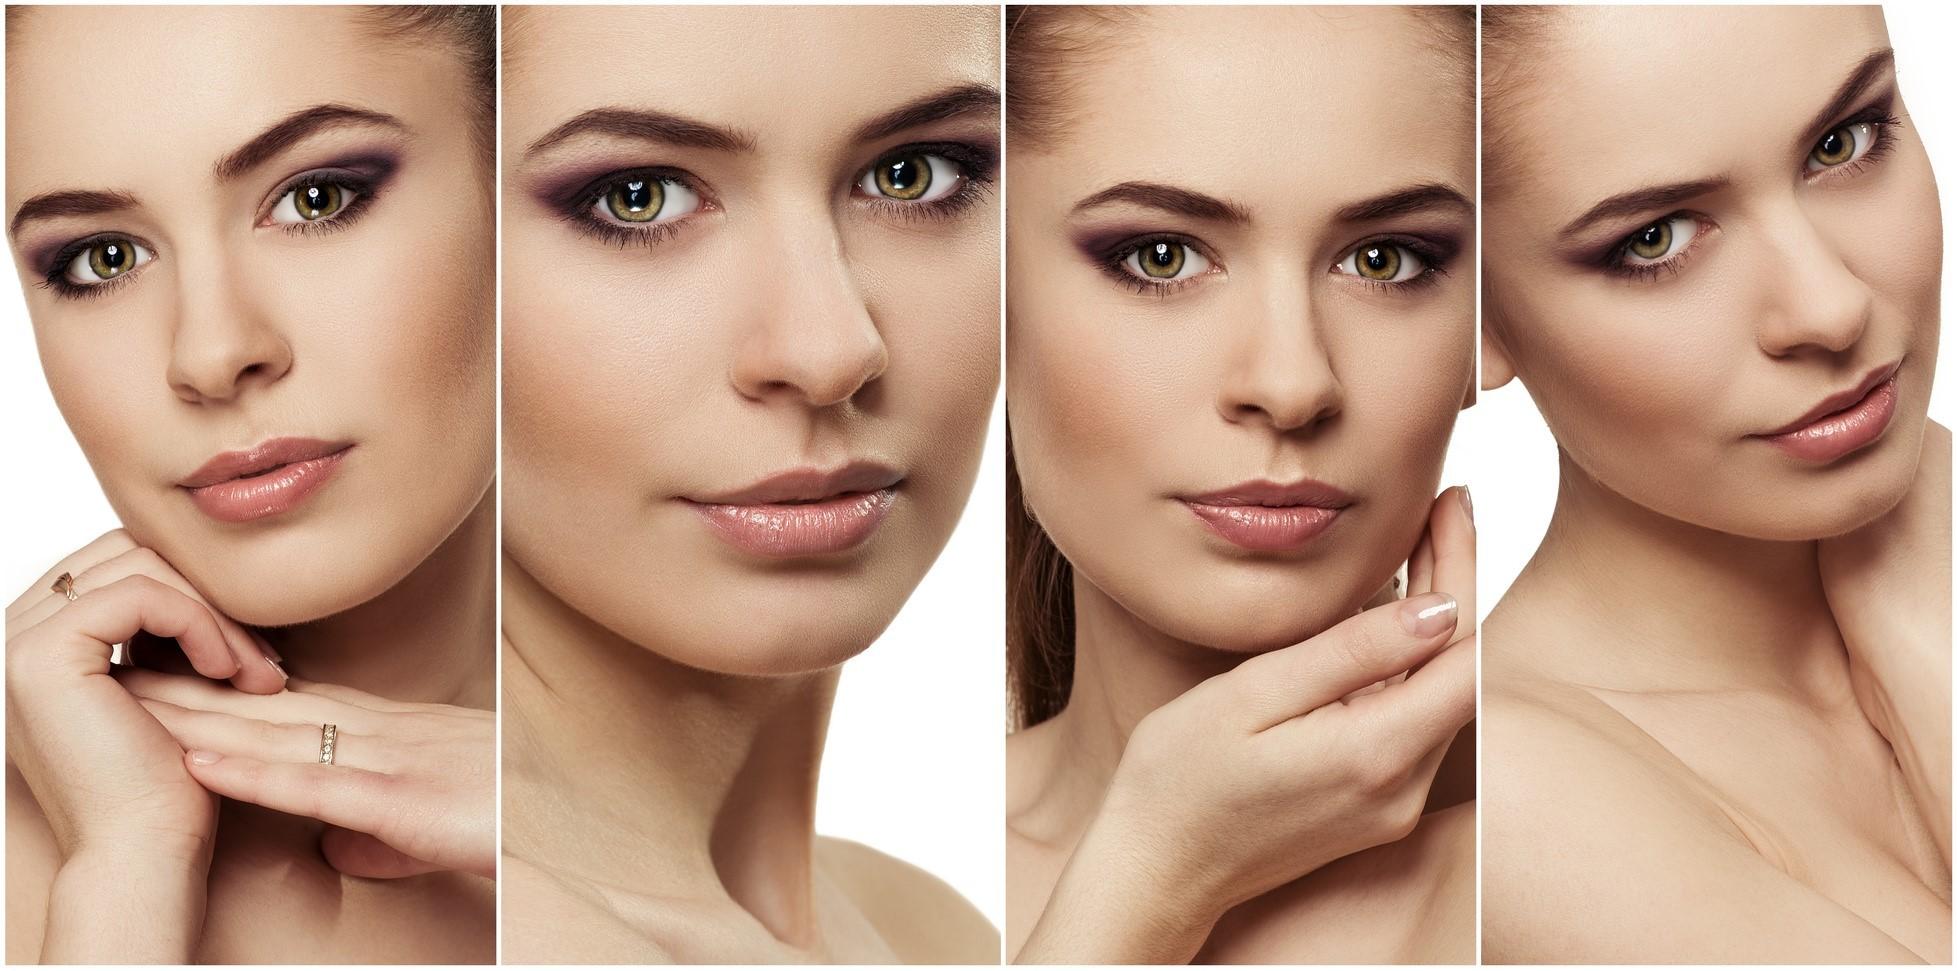 Efectele imbatranirii asupra pielii